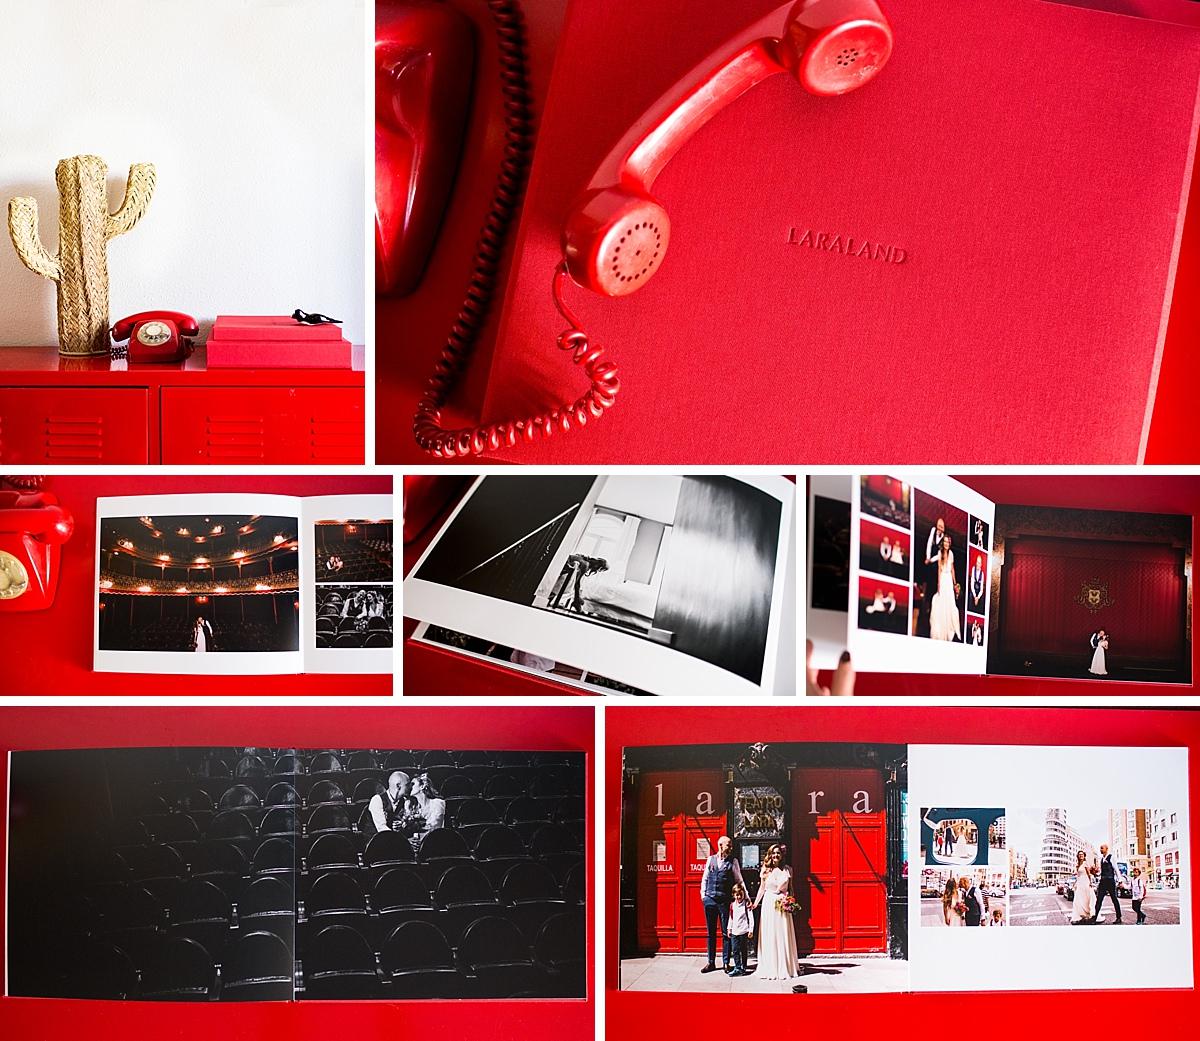 088-albamay-fotografia-artistica-boda-teatro-lara-madrid-1200x800-